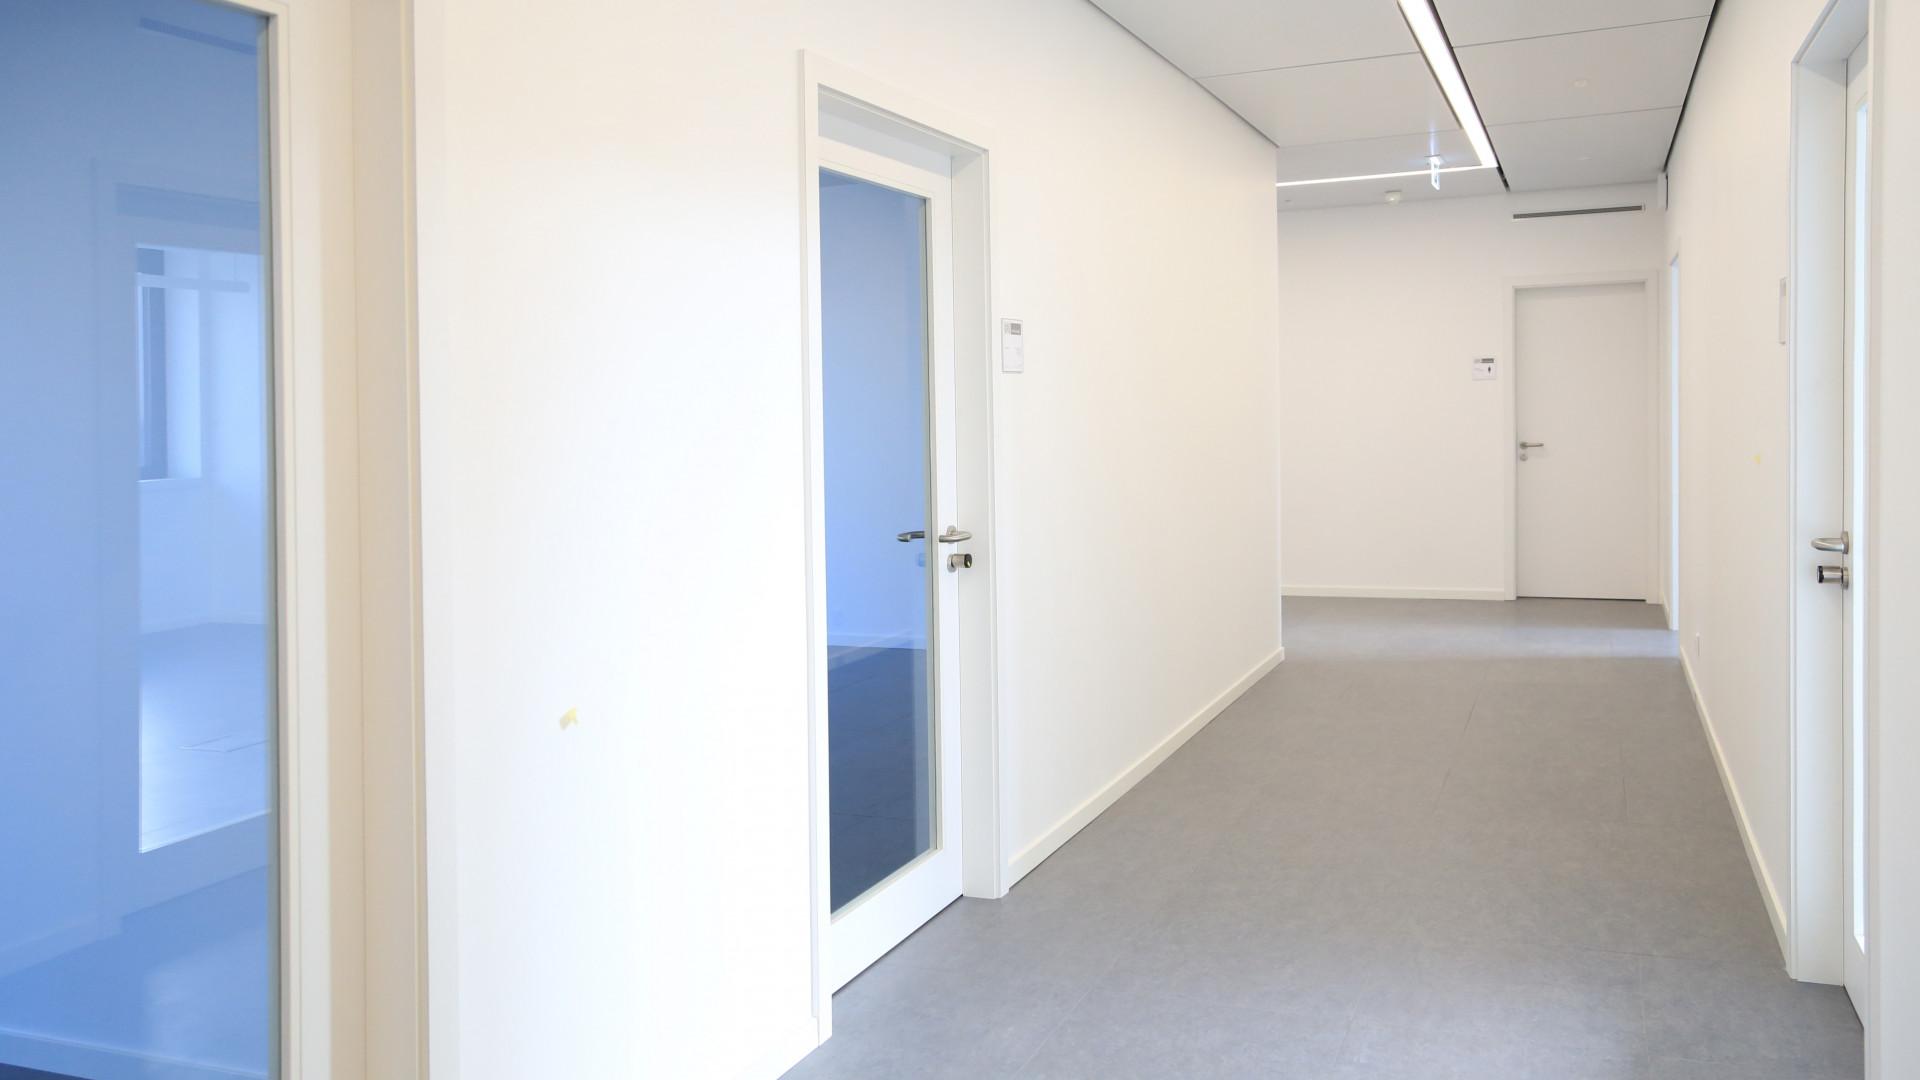 Sol Pvc Salle A Manger bamolux installe vos sols souples au luxembourg